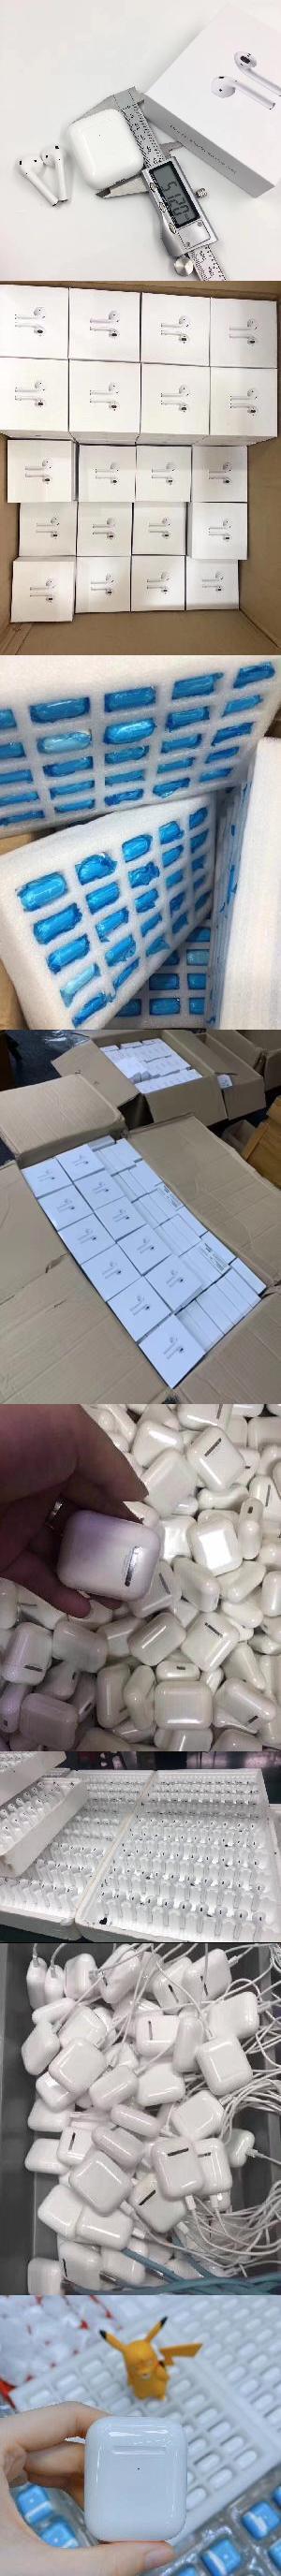 China goedkope draadloze headset bluetooth hoofdtelefoon draadloze hoofdtelefoon met microfoon draadloze hoofdtelefoon draadloze OEM Fabriek